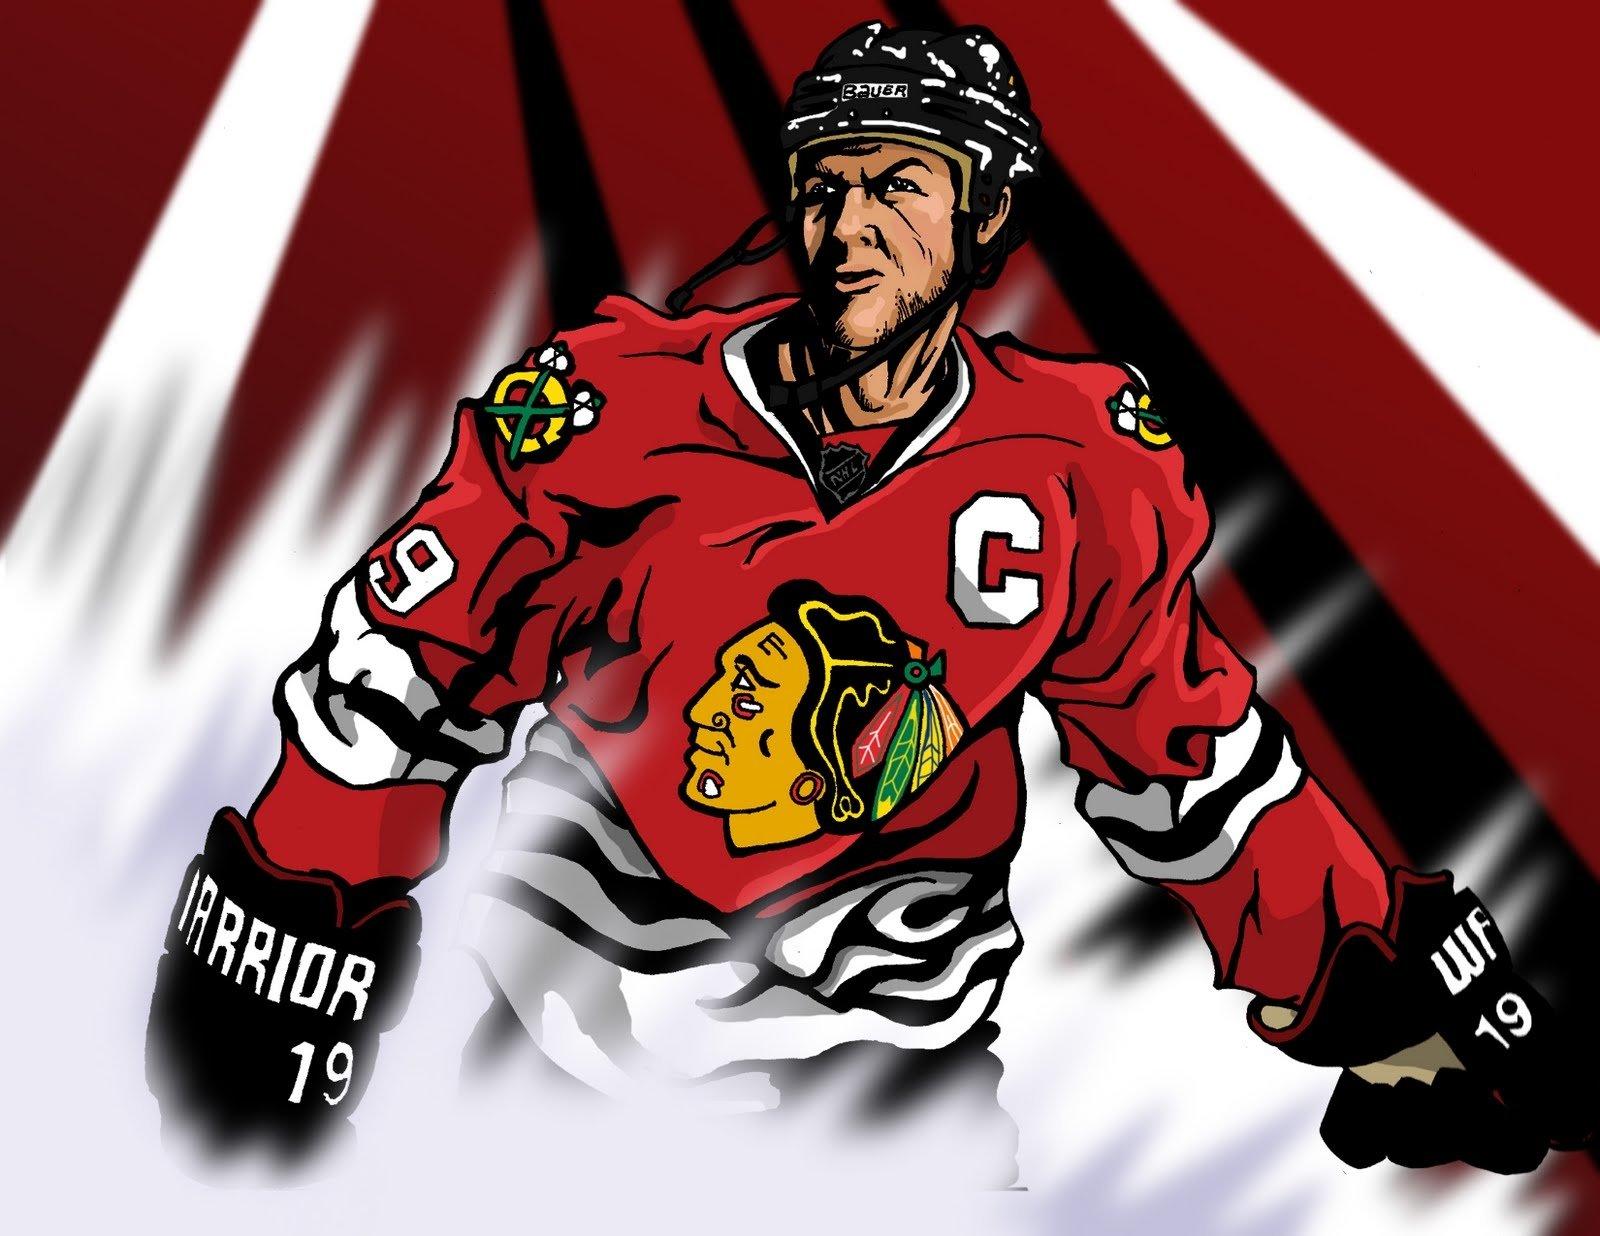 Hd Blackhawks Wallpaper Chicago Blackhawks Wallpaper And Background Image